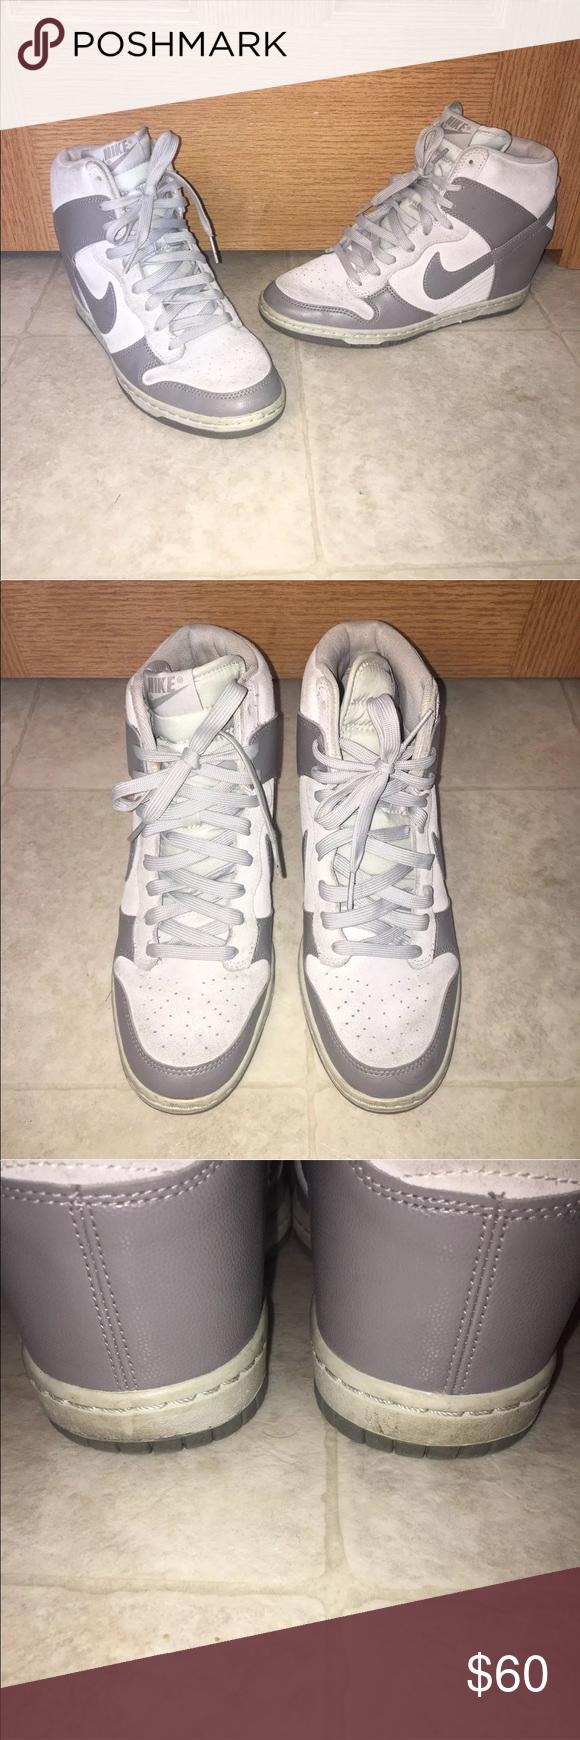 kup sprzedaż Kod kuponu kup popularne NIKE DUNK SKY HI Wedge Sneakers Size 9 528899 005 • ITEM ...